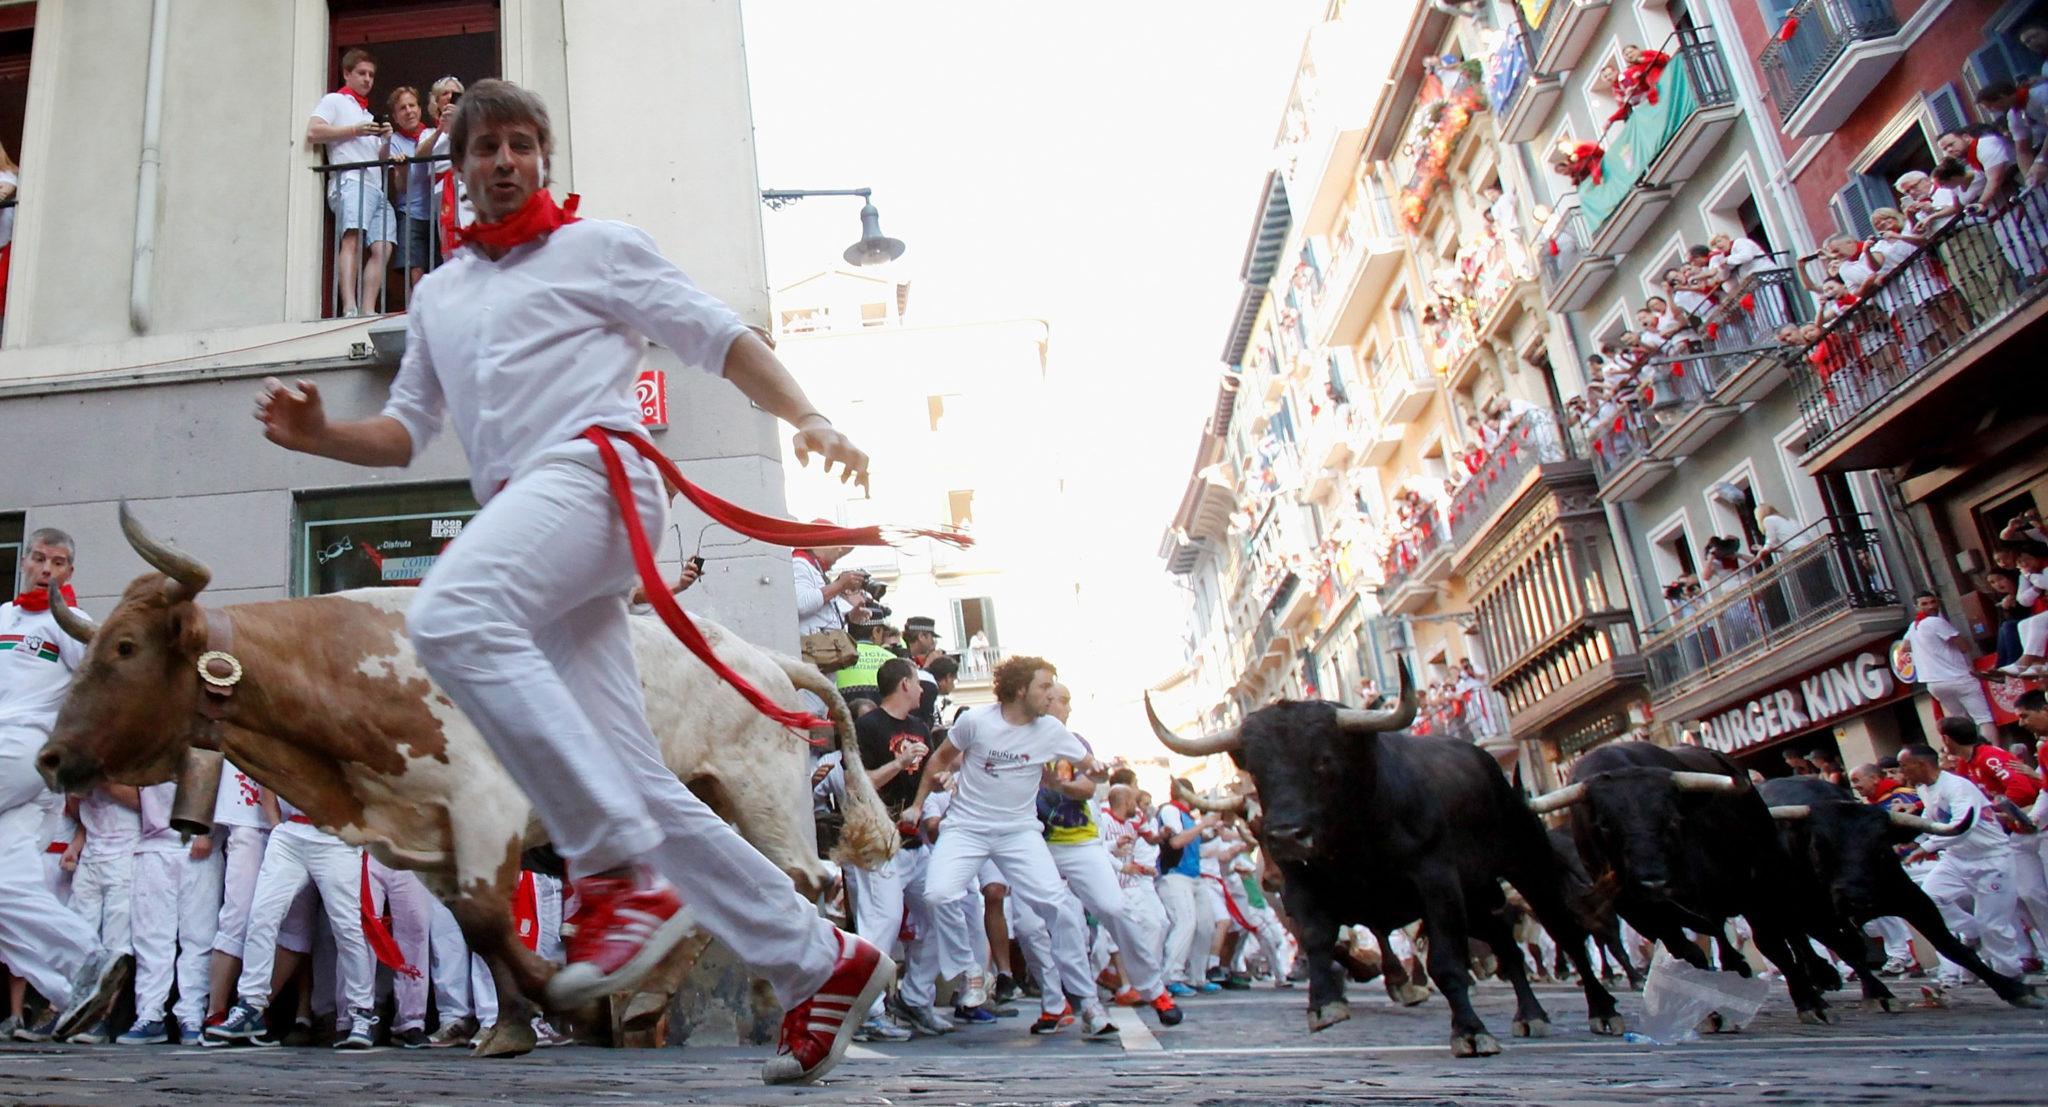 Fiestas de Sanfermín